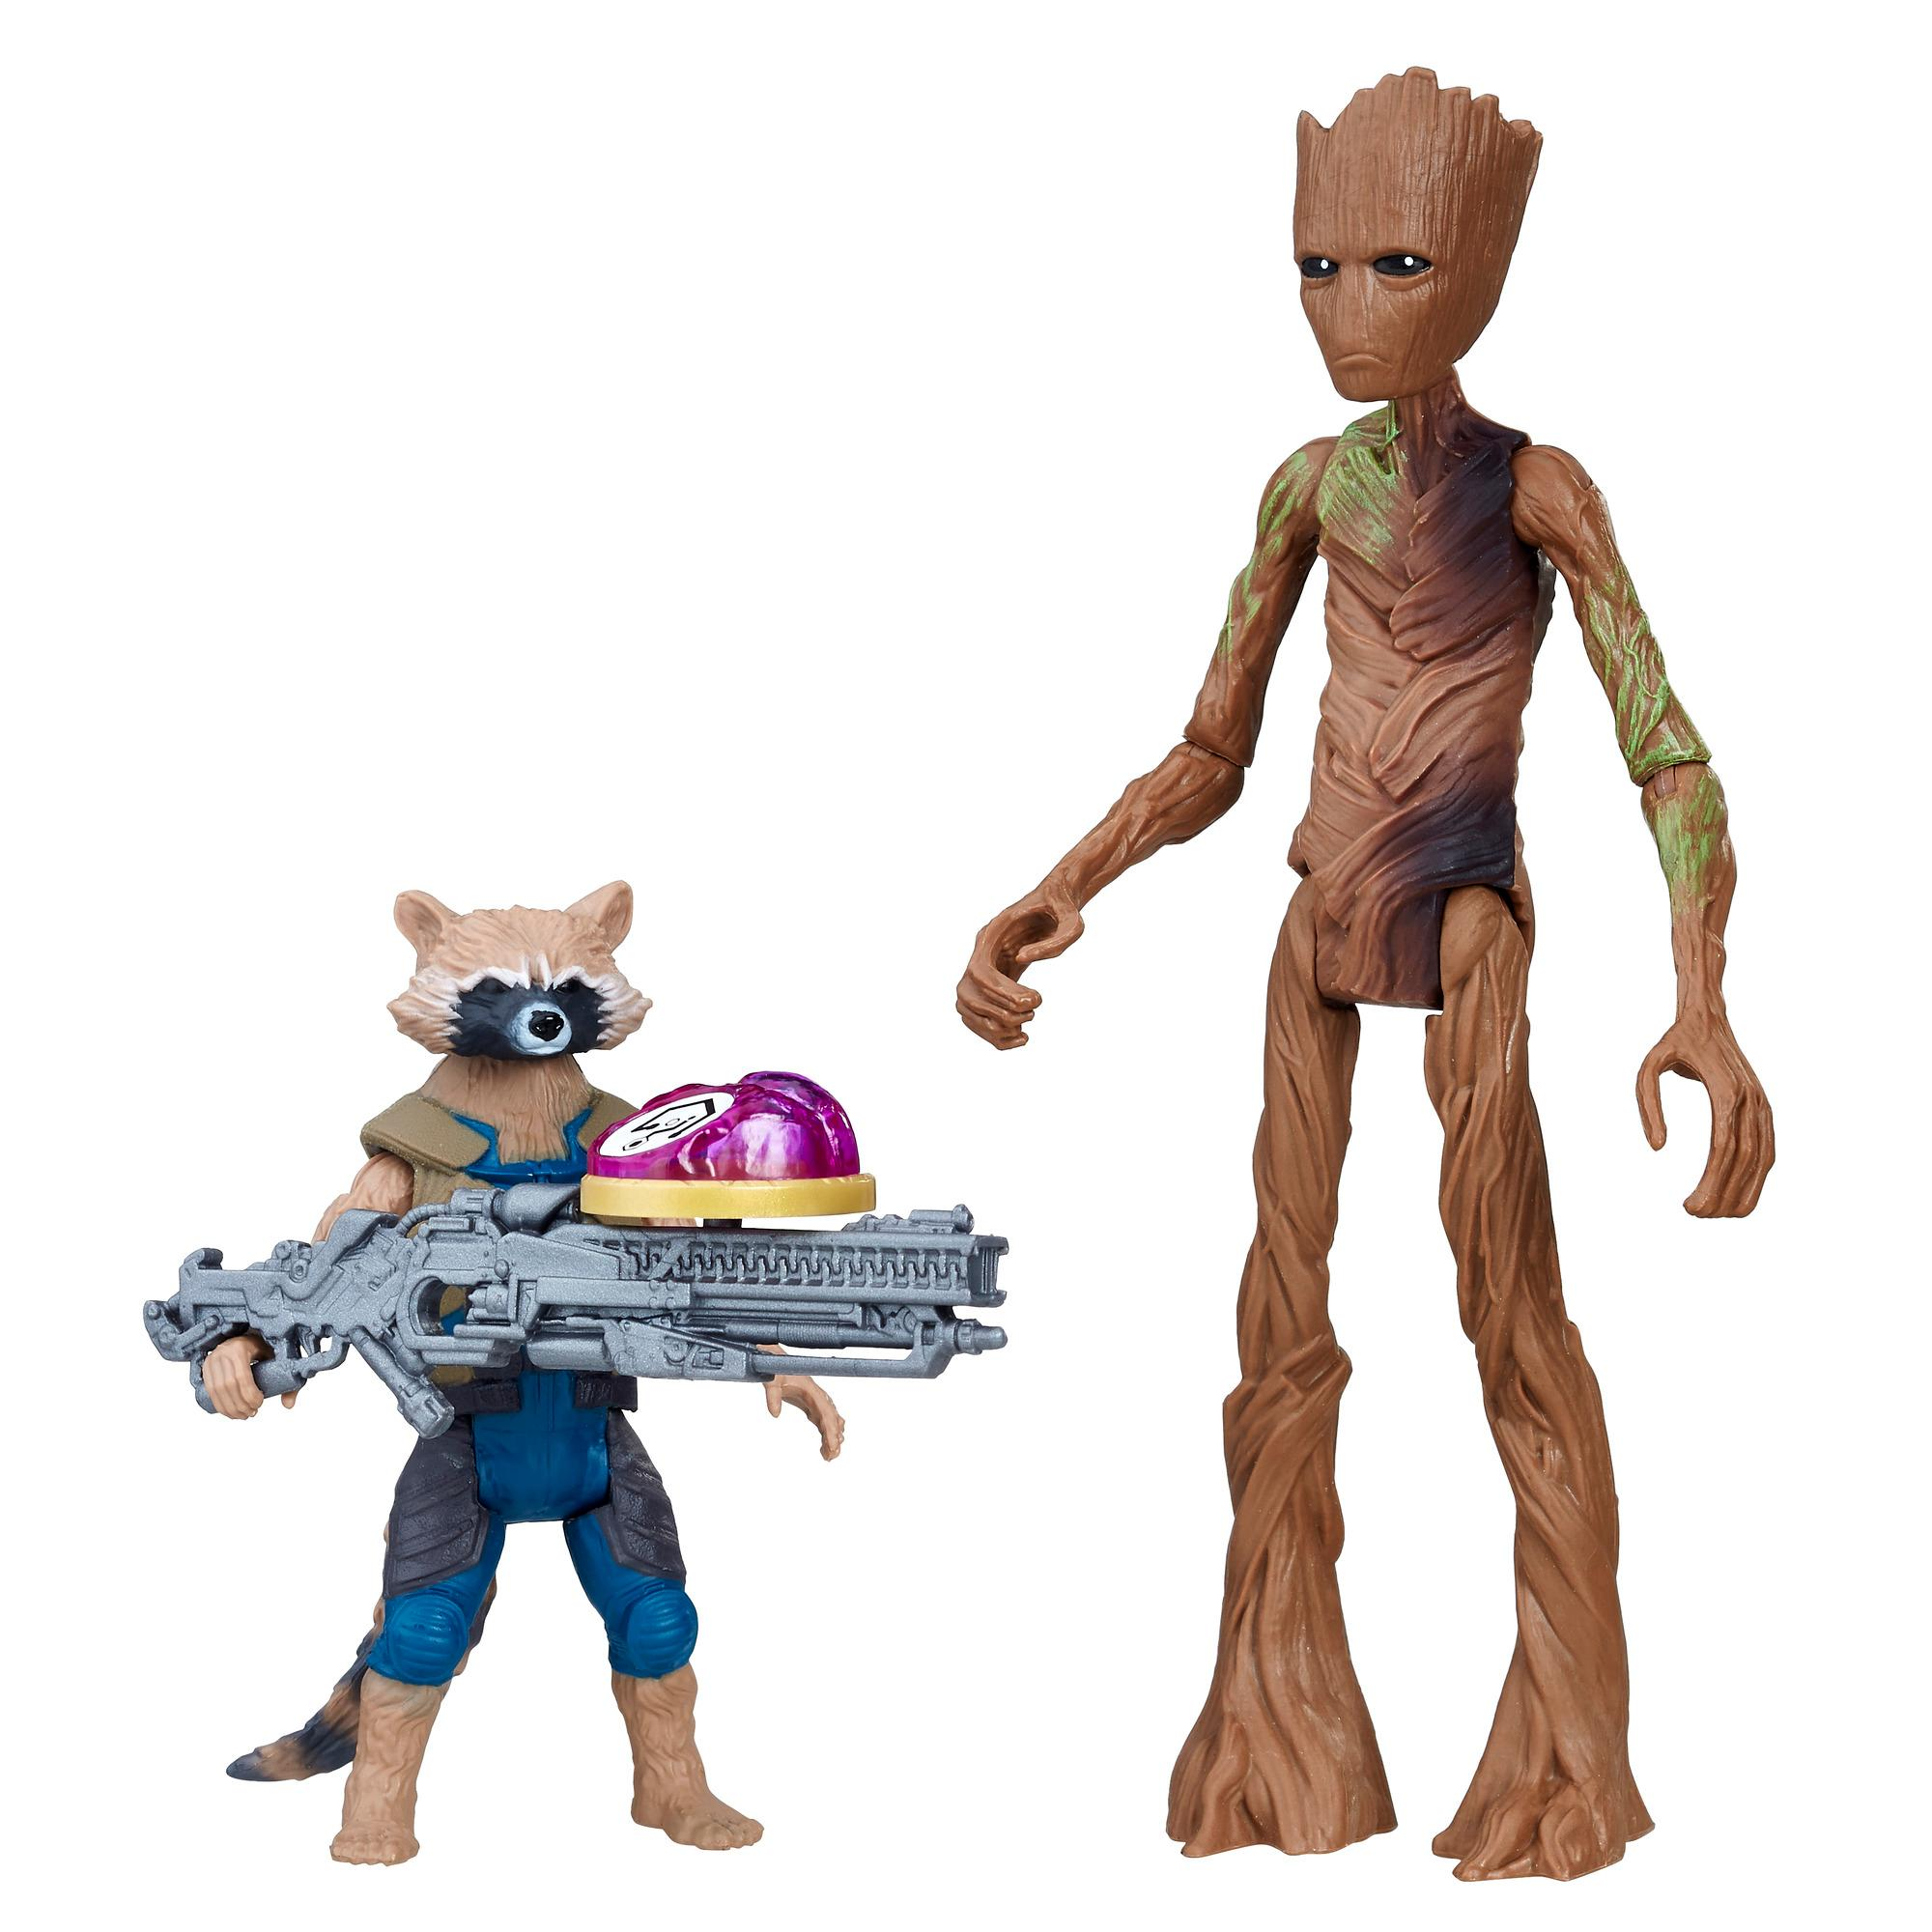 Marvel Avengers: Guerra del Infinito - Rocket Raccoon & Groot con Gema del Infinito